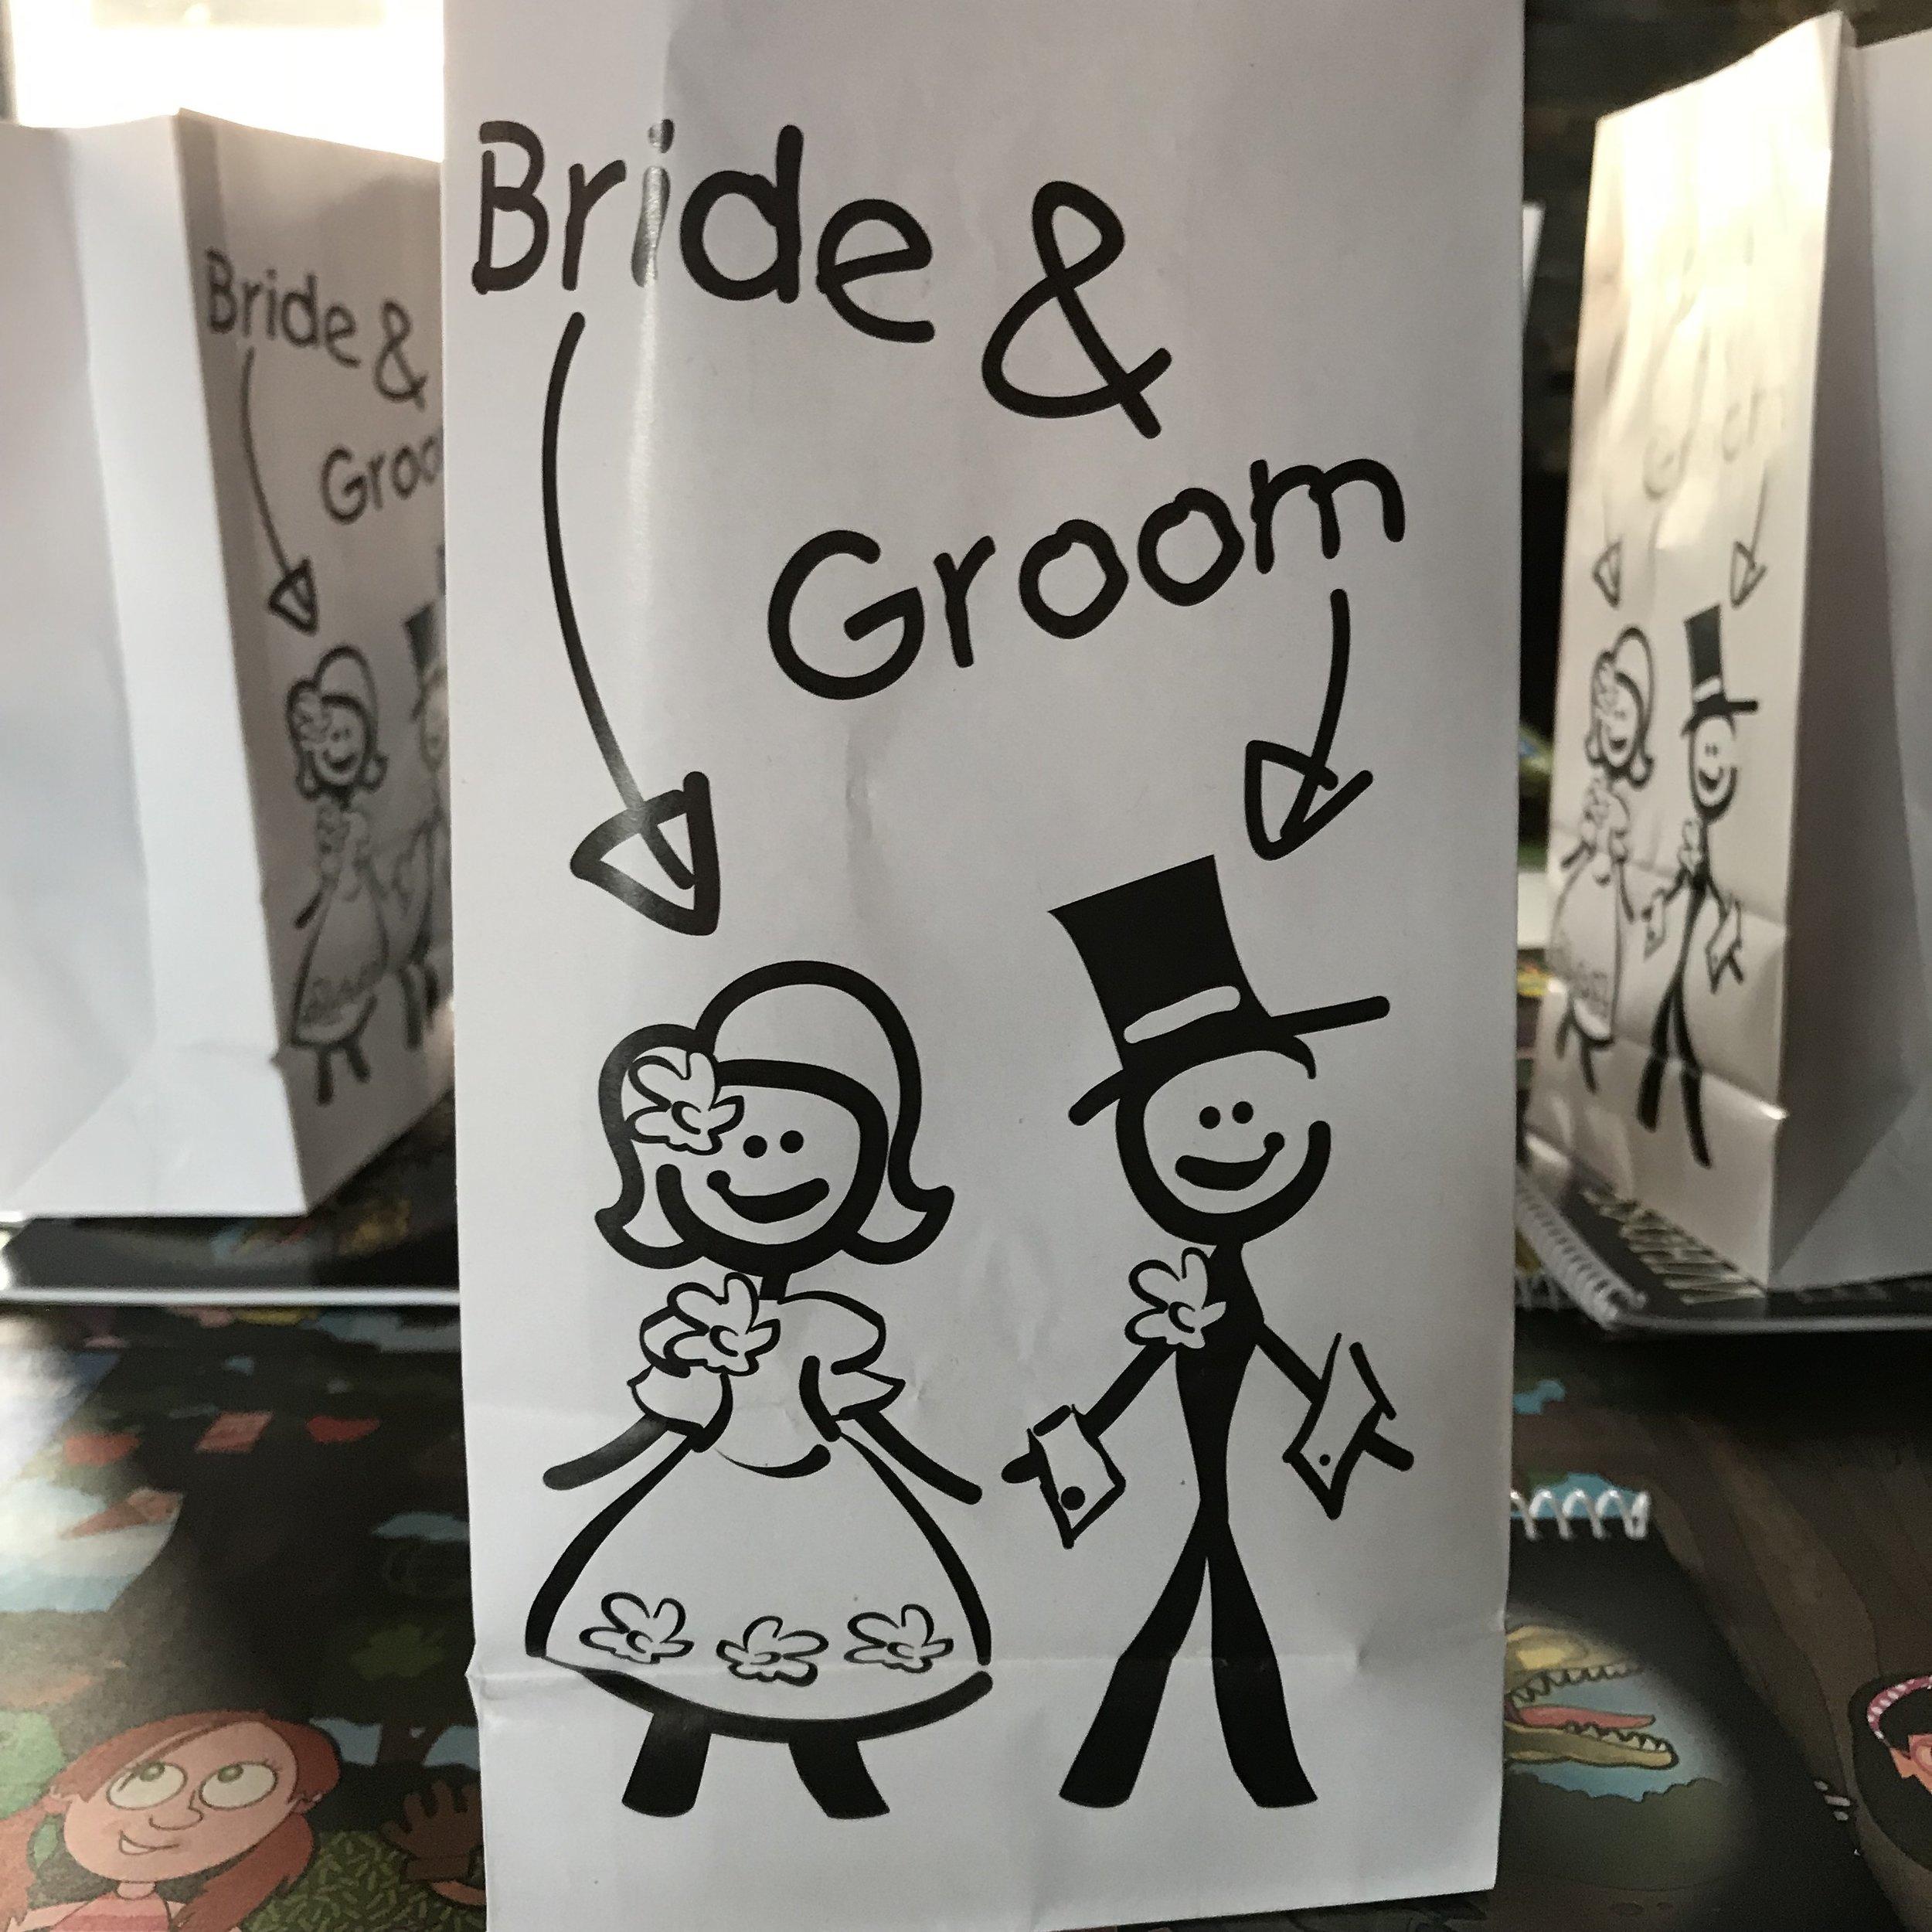 Bride & Groom bag by DJ Jim Cerone